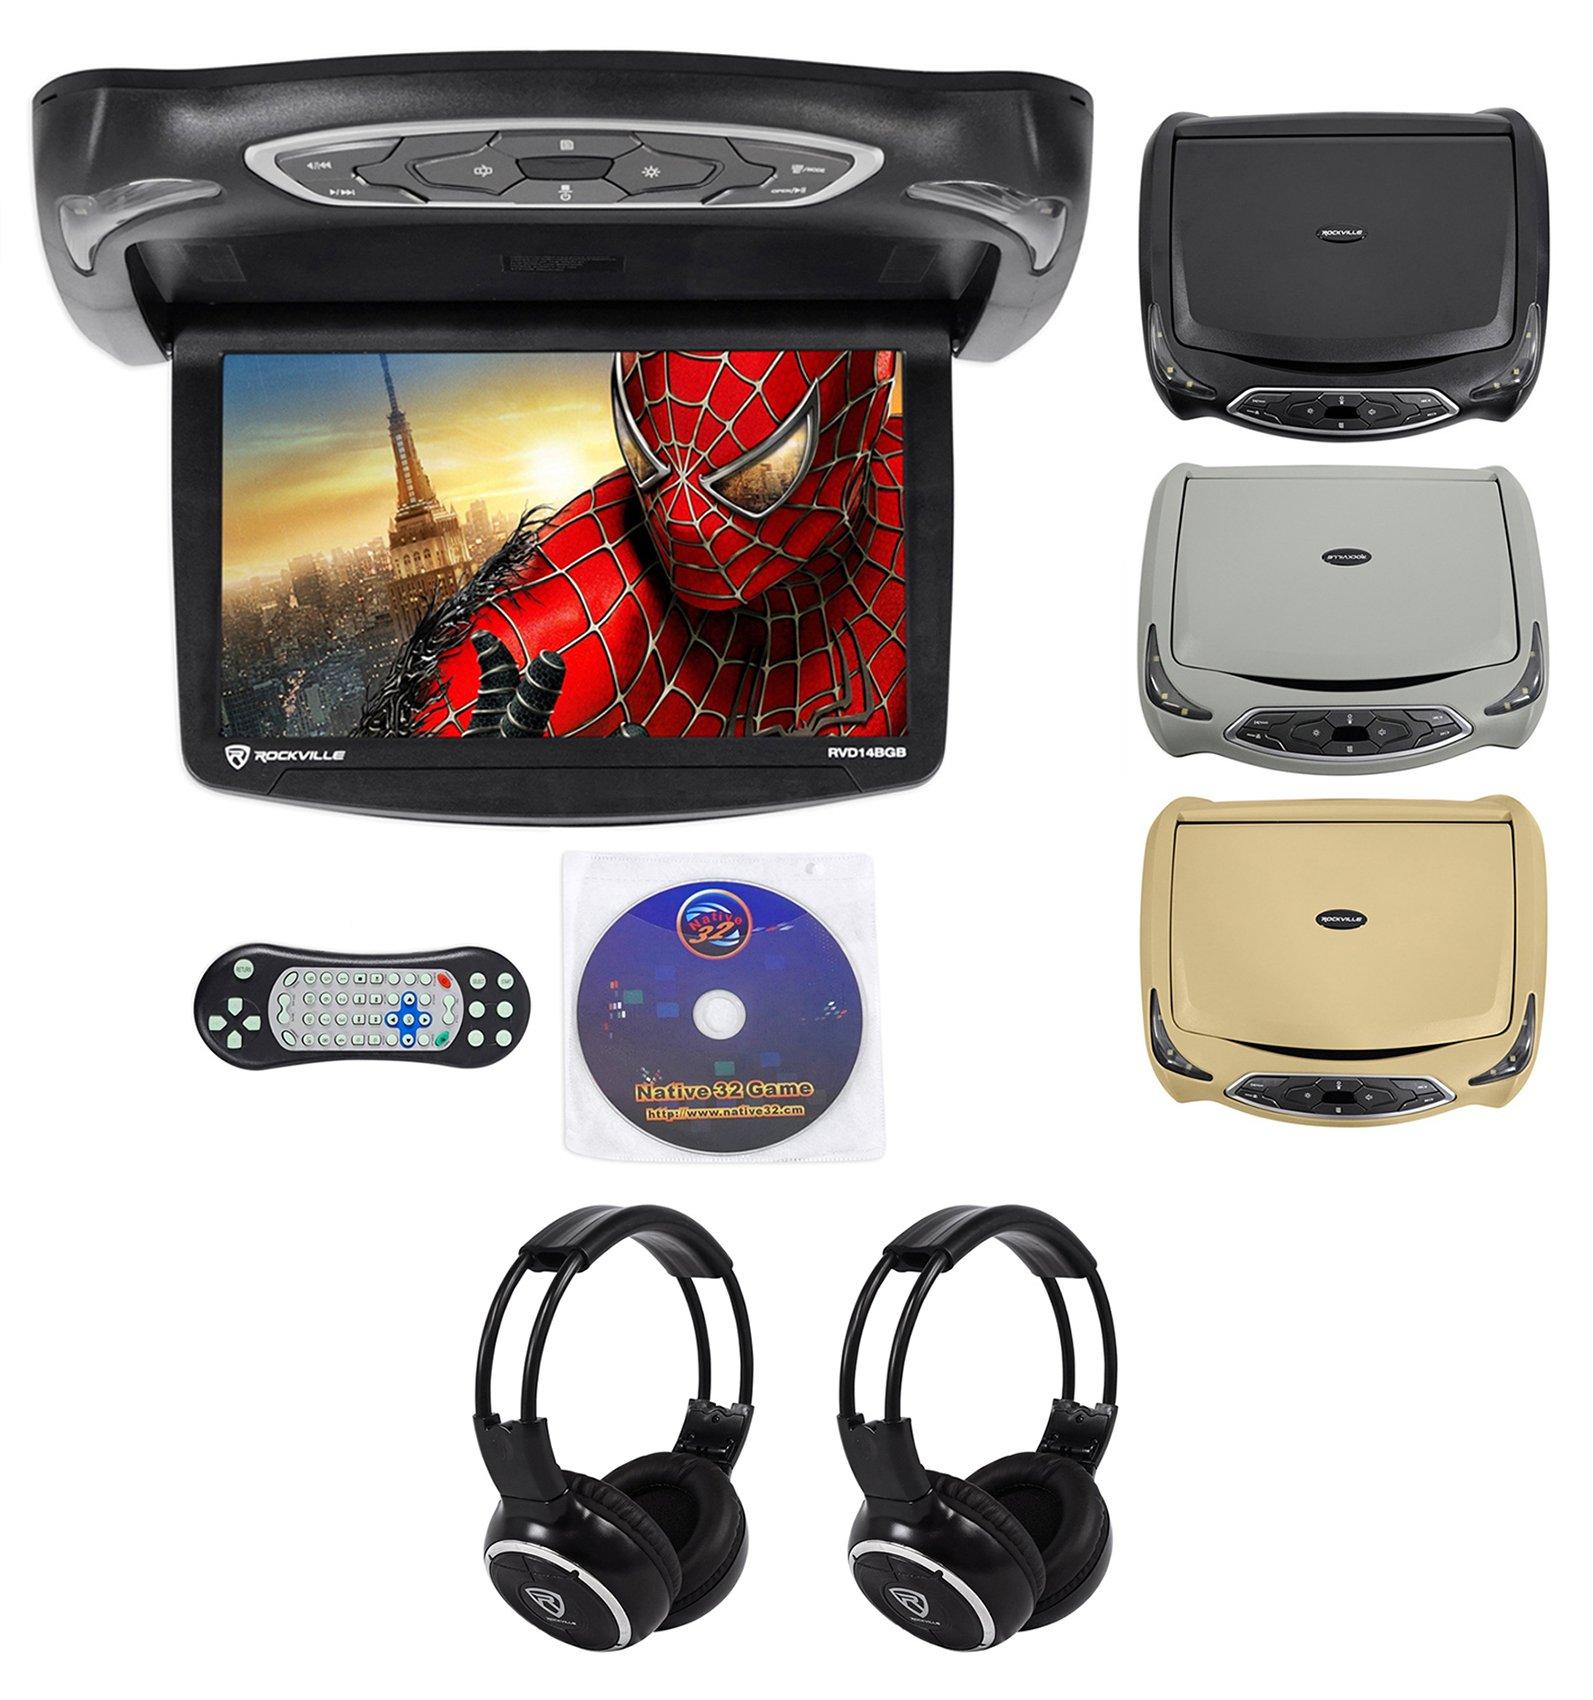 Rockville RVD14BGB Black/Grey/Tan 14'' Flip Down Car DVD Monitor+Games+Headphones by Rockville (Image #1)